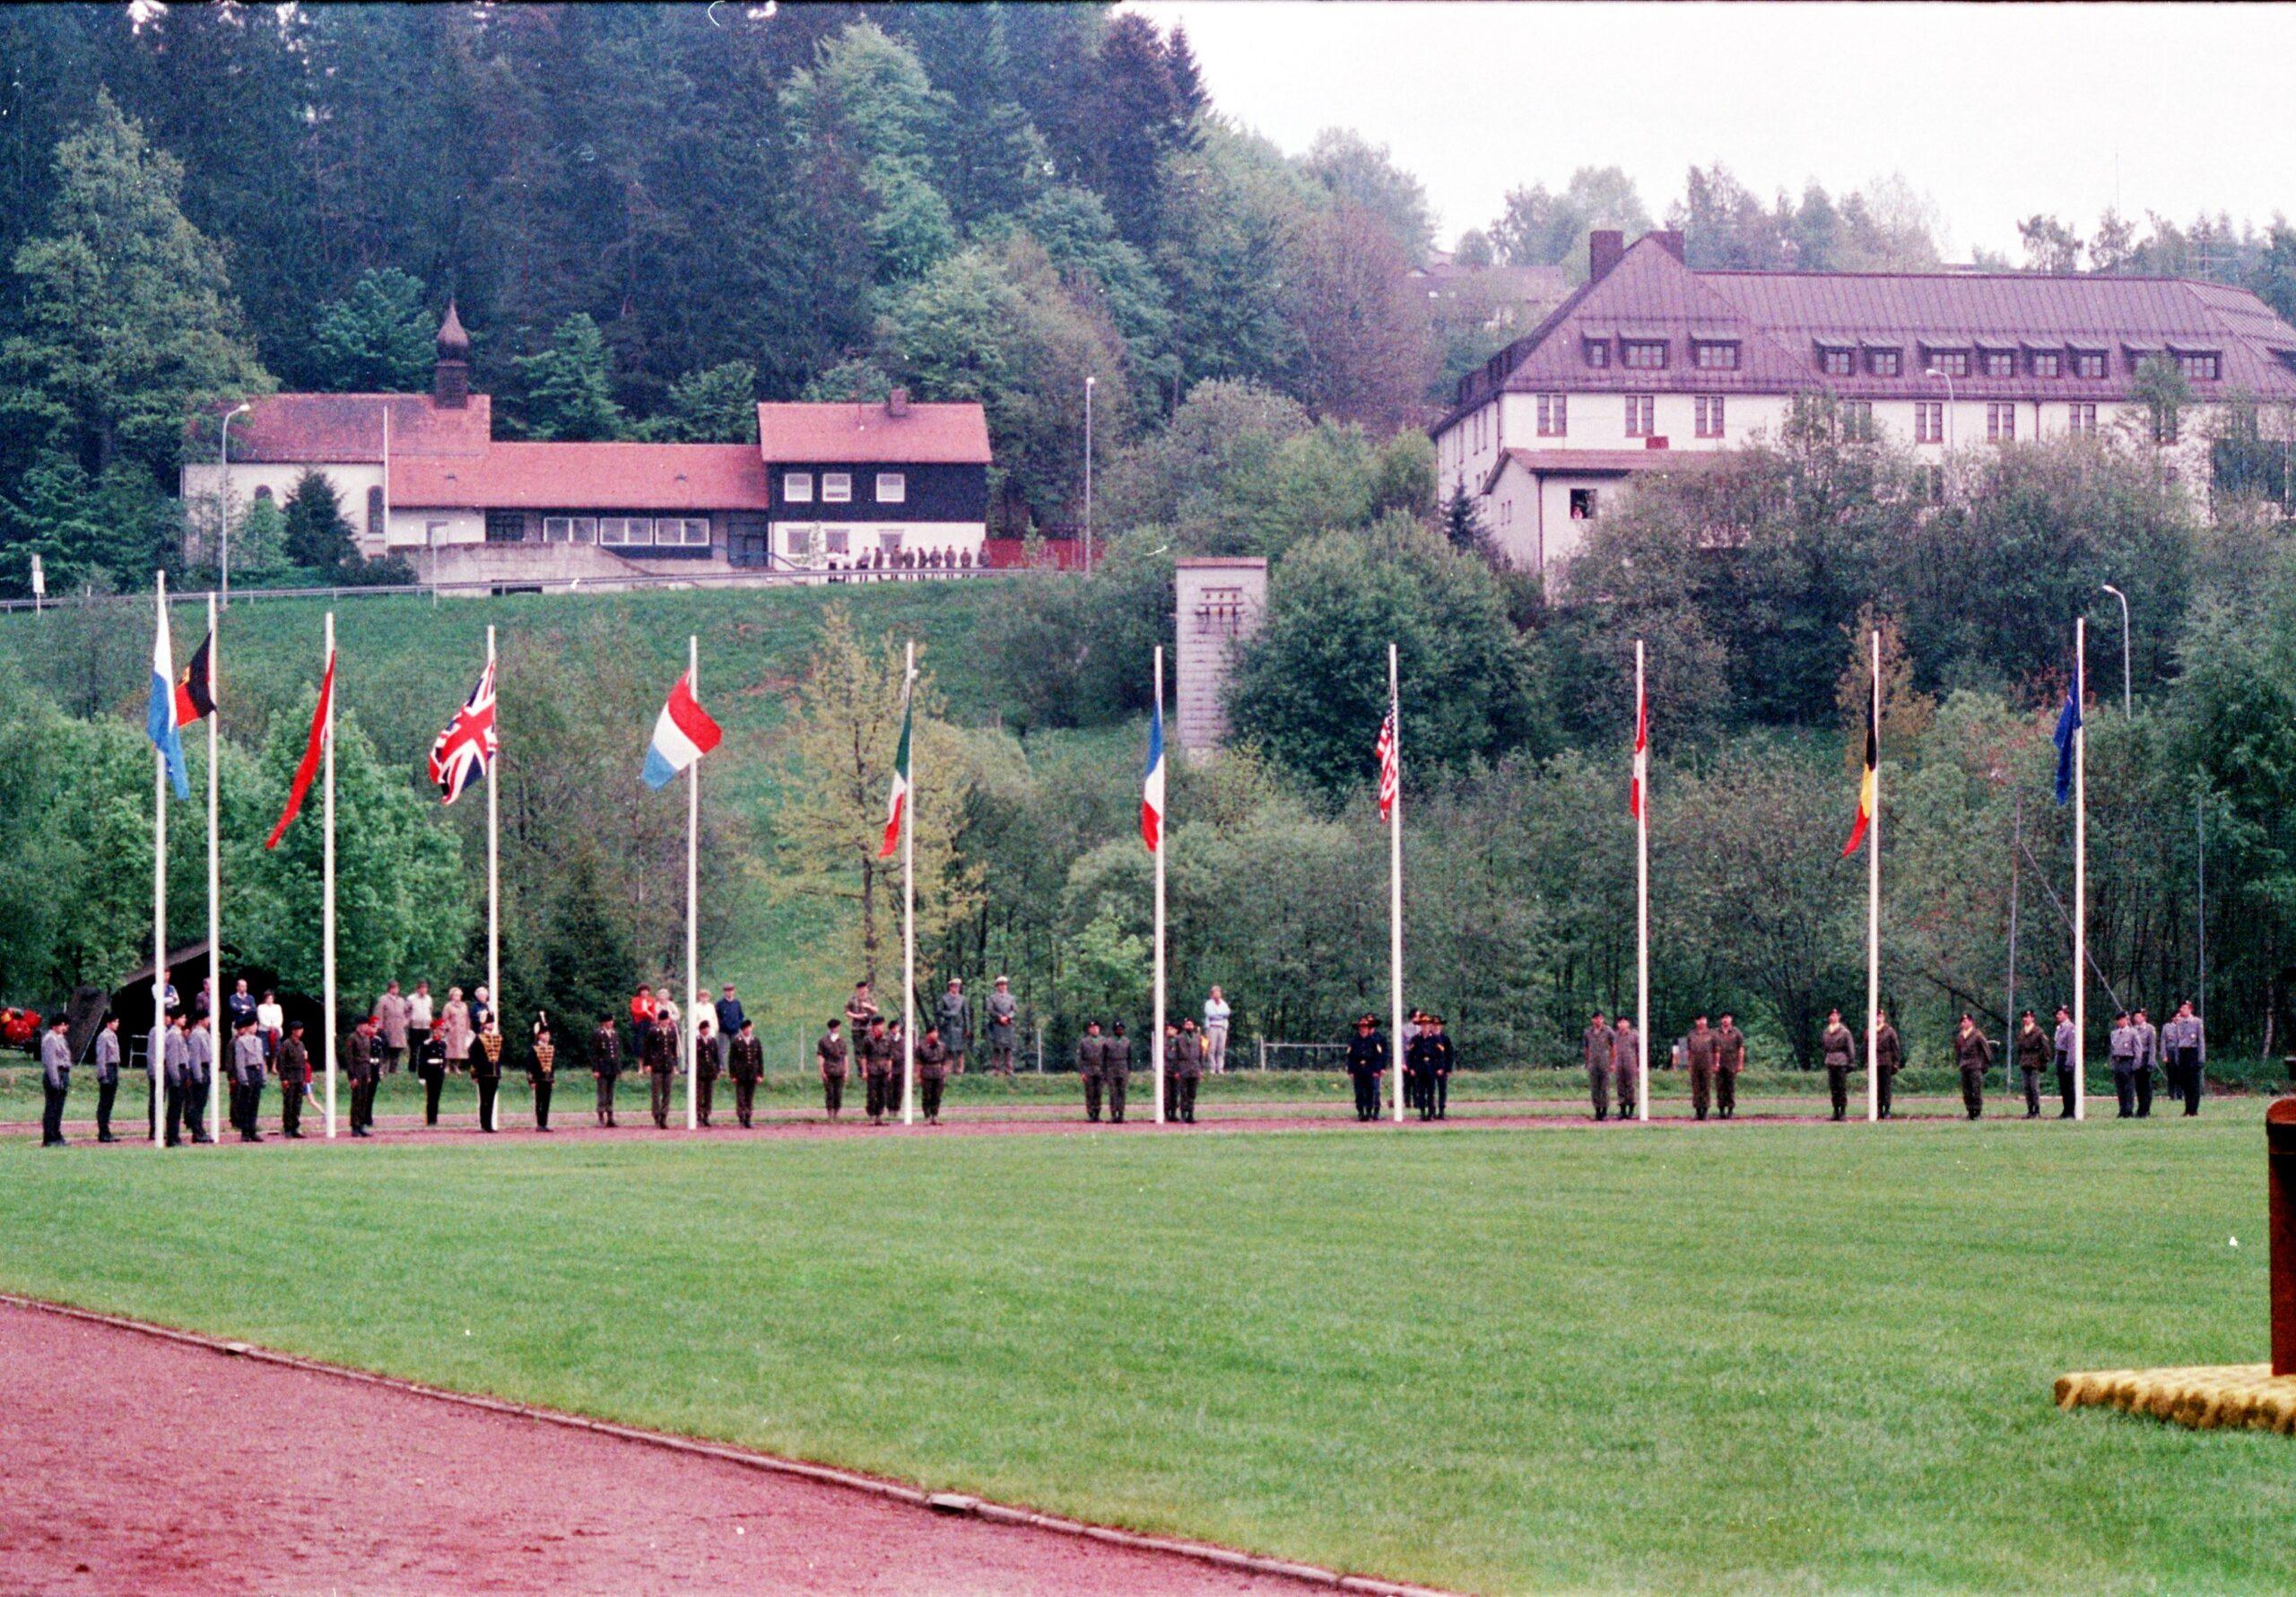 1983 1987 B Esk 103 Verkbat Boeselager wedstrijden. Opstelling. Inz. Wmr I Jan Pol 7